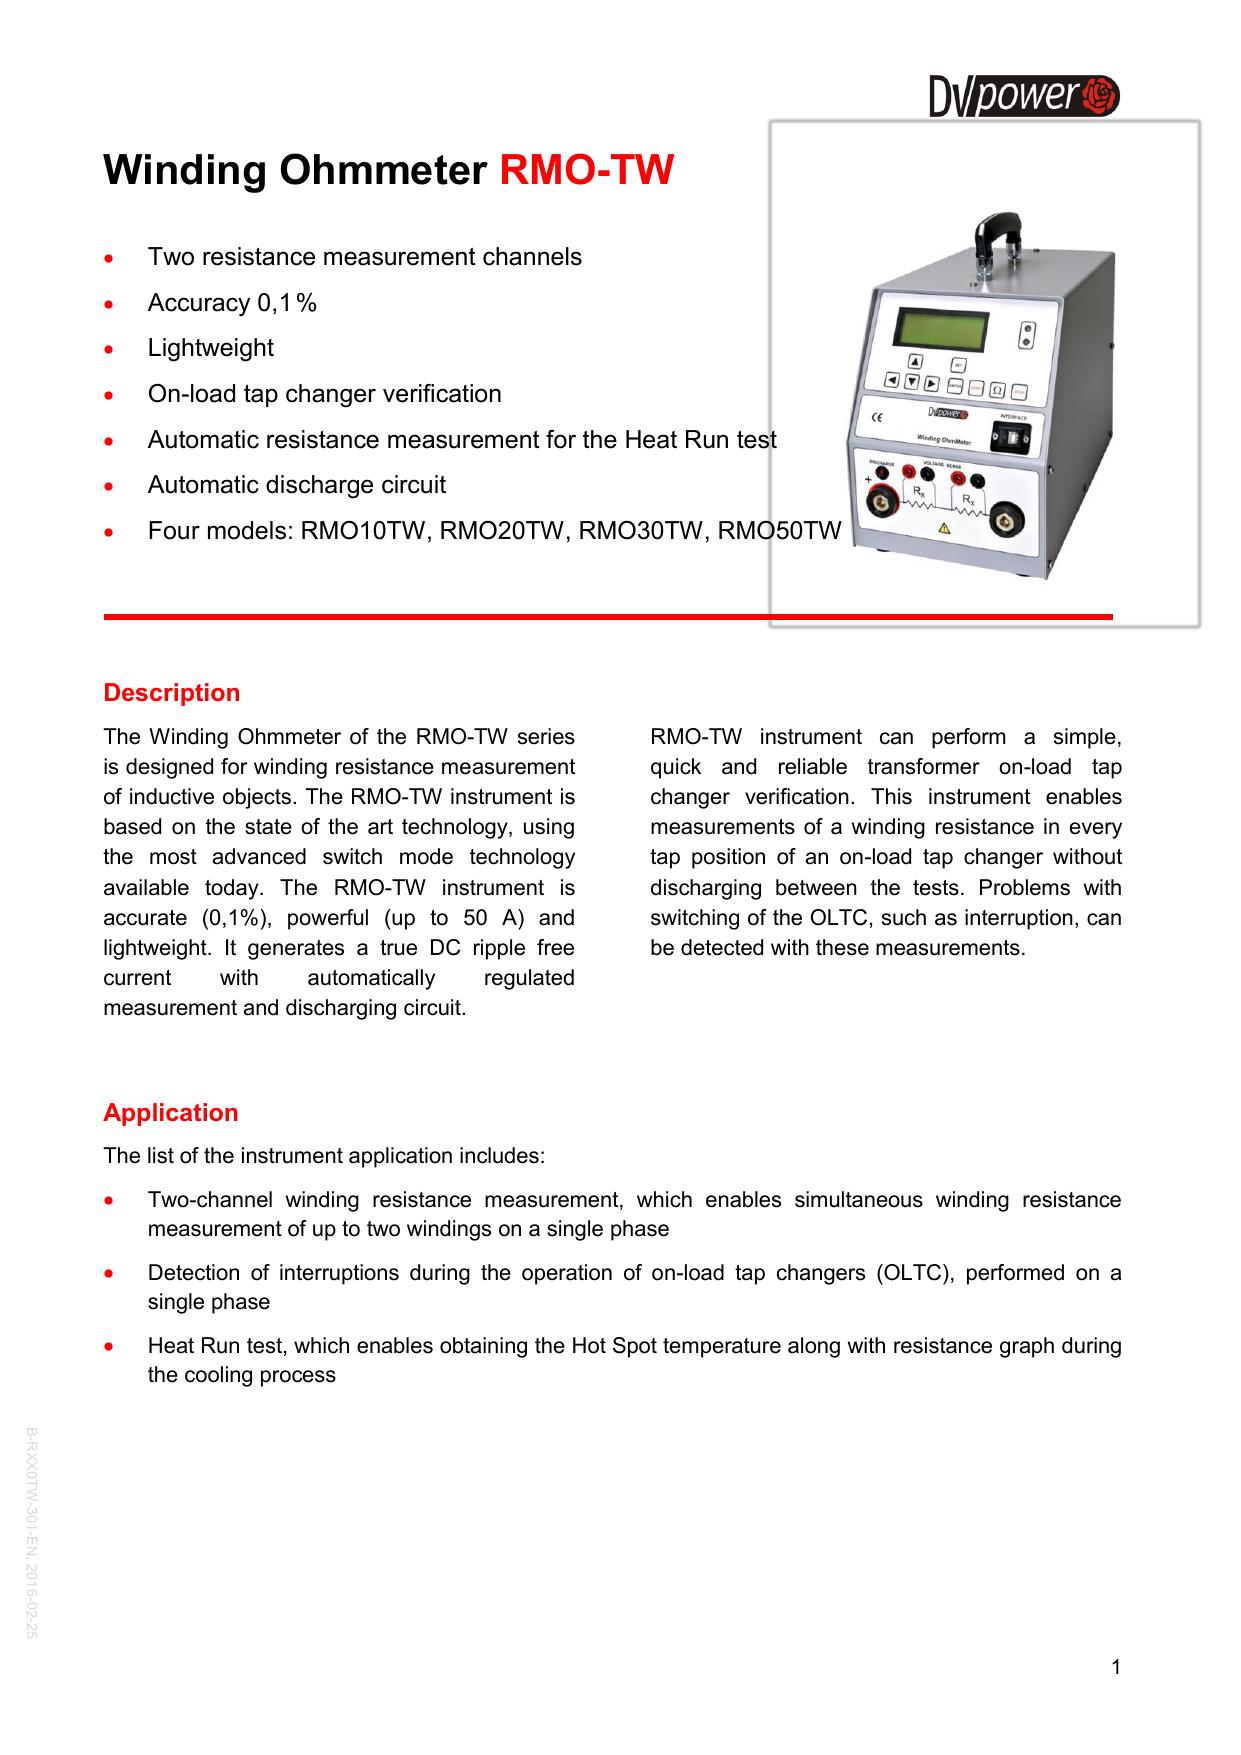 Winding Ohmmeter RMO-TW | manualzz com